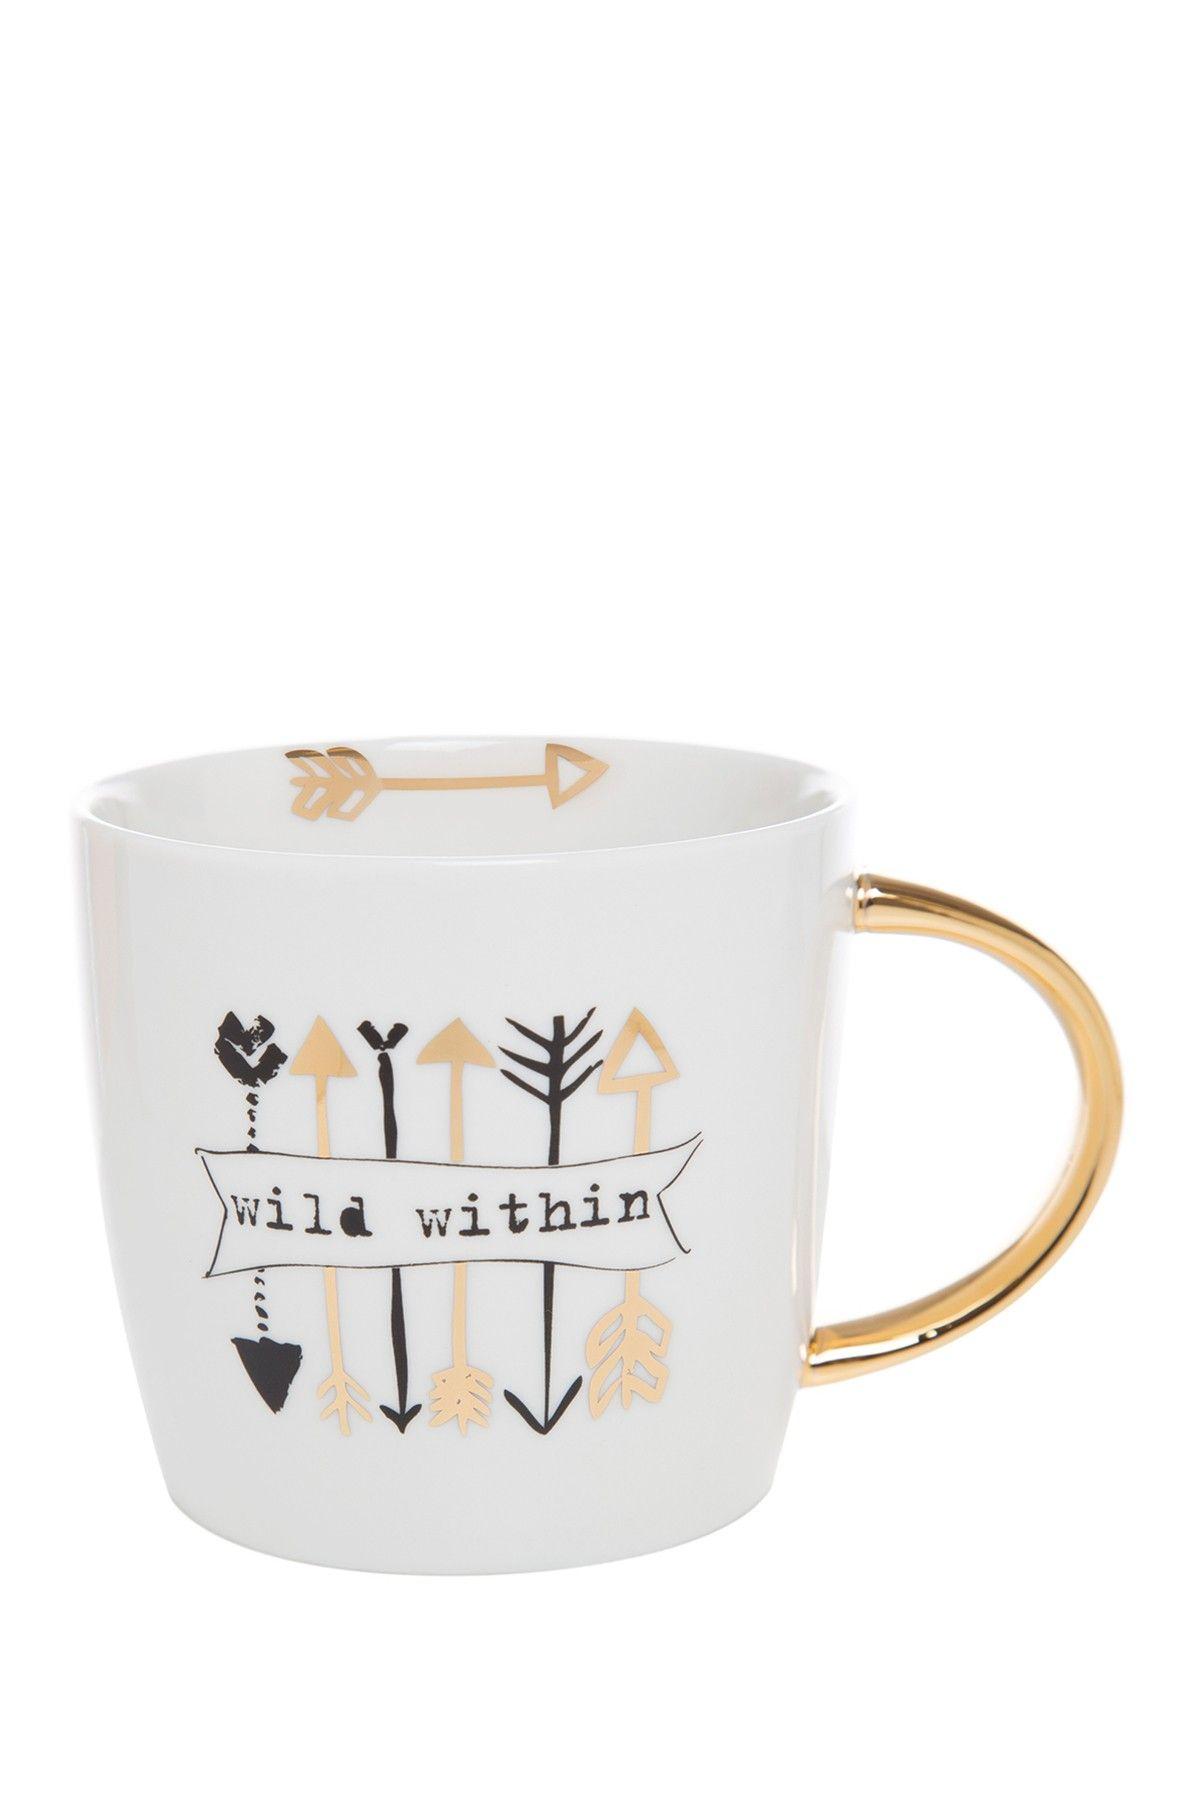 Slant Designs Wild Within Mug 14 Oz Mugs Diy Mugs Coffee